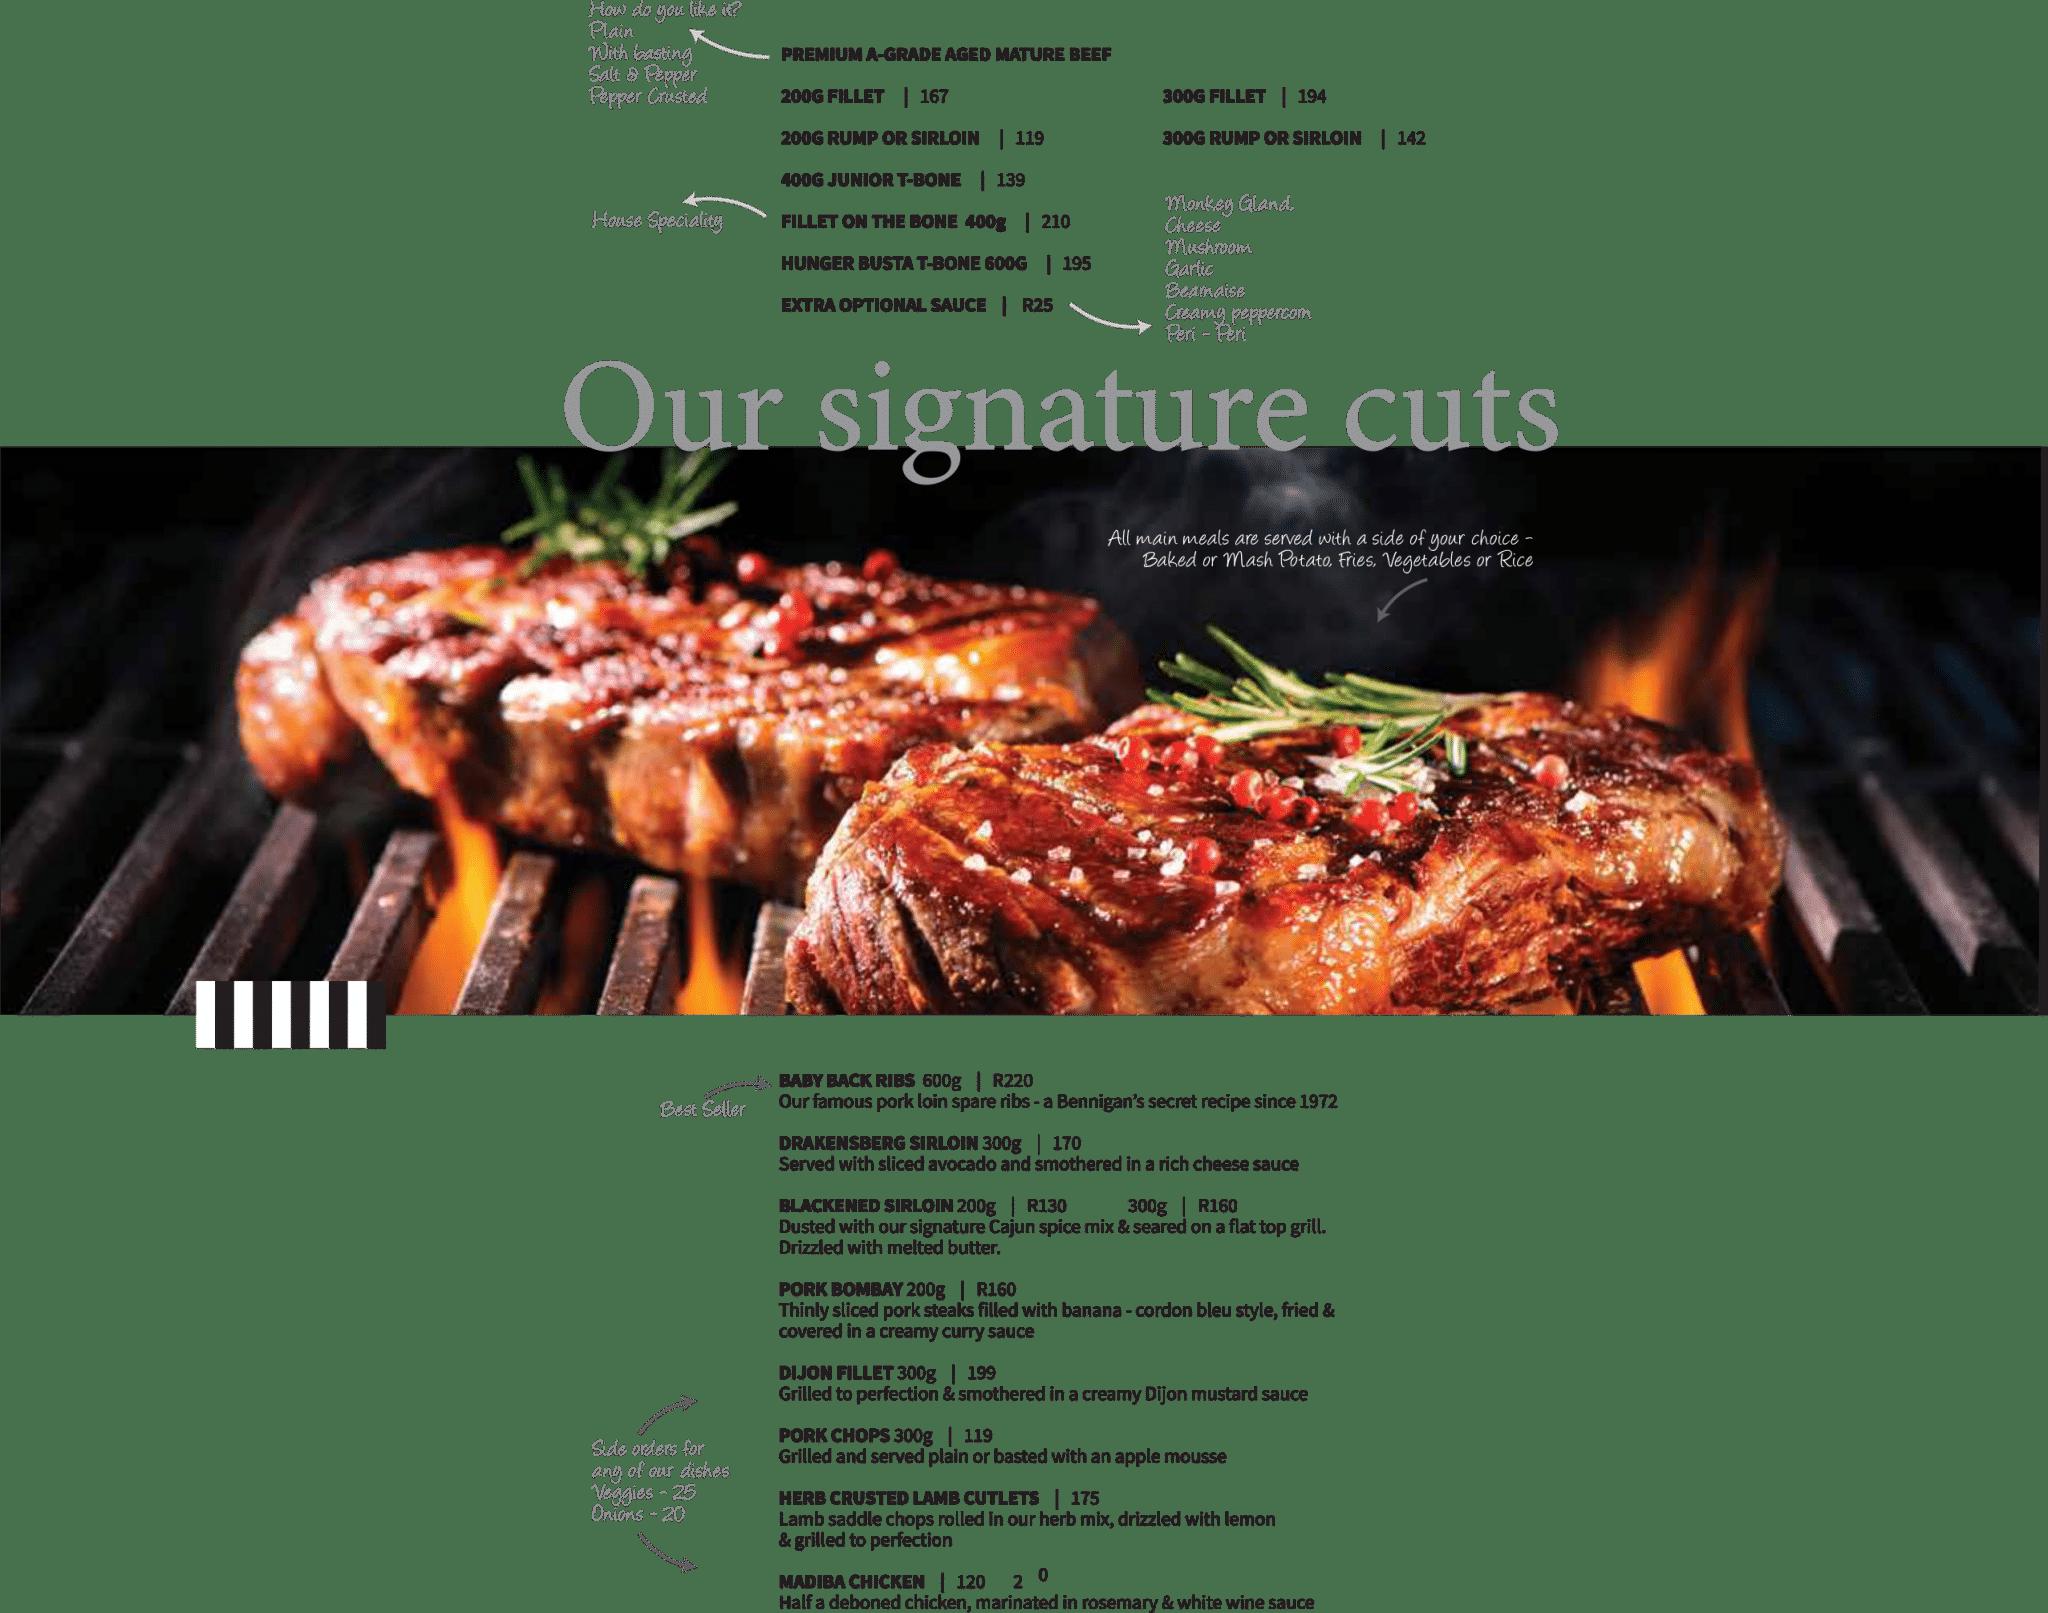 Signature cuts-a